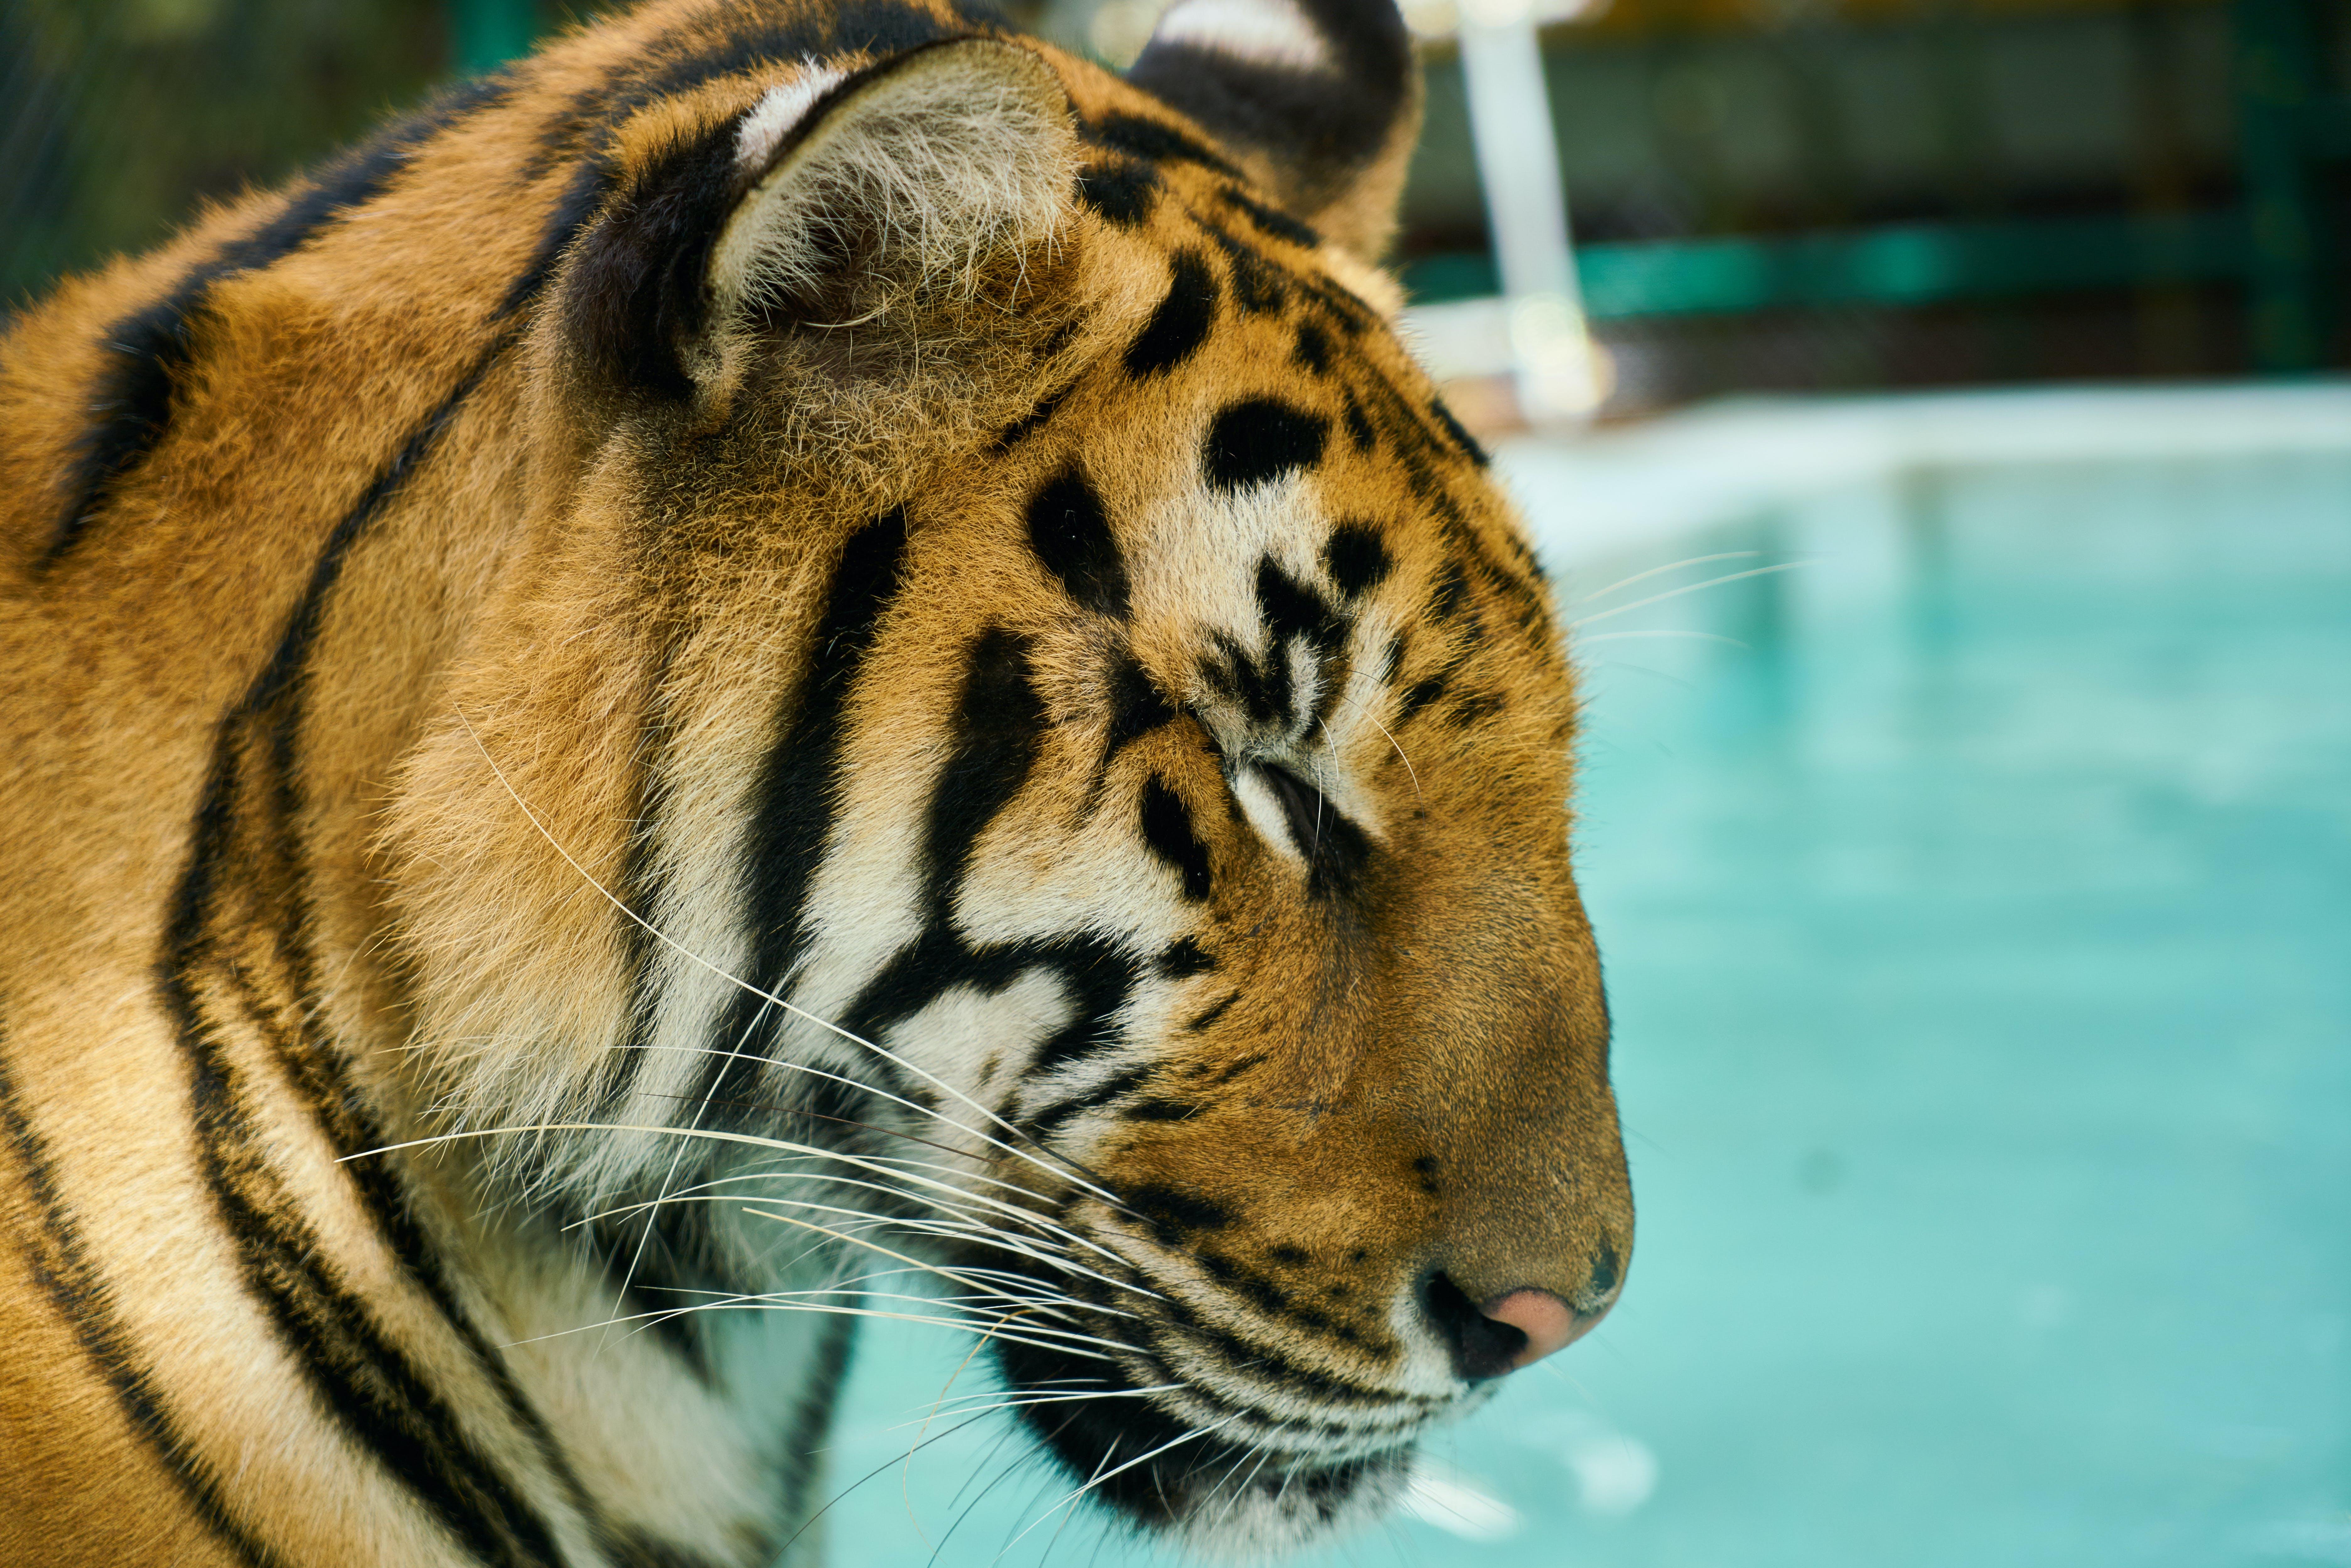 Shallow Focus Photo of Tiger